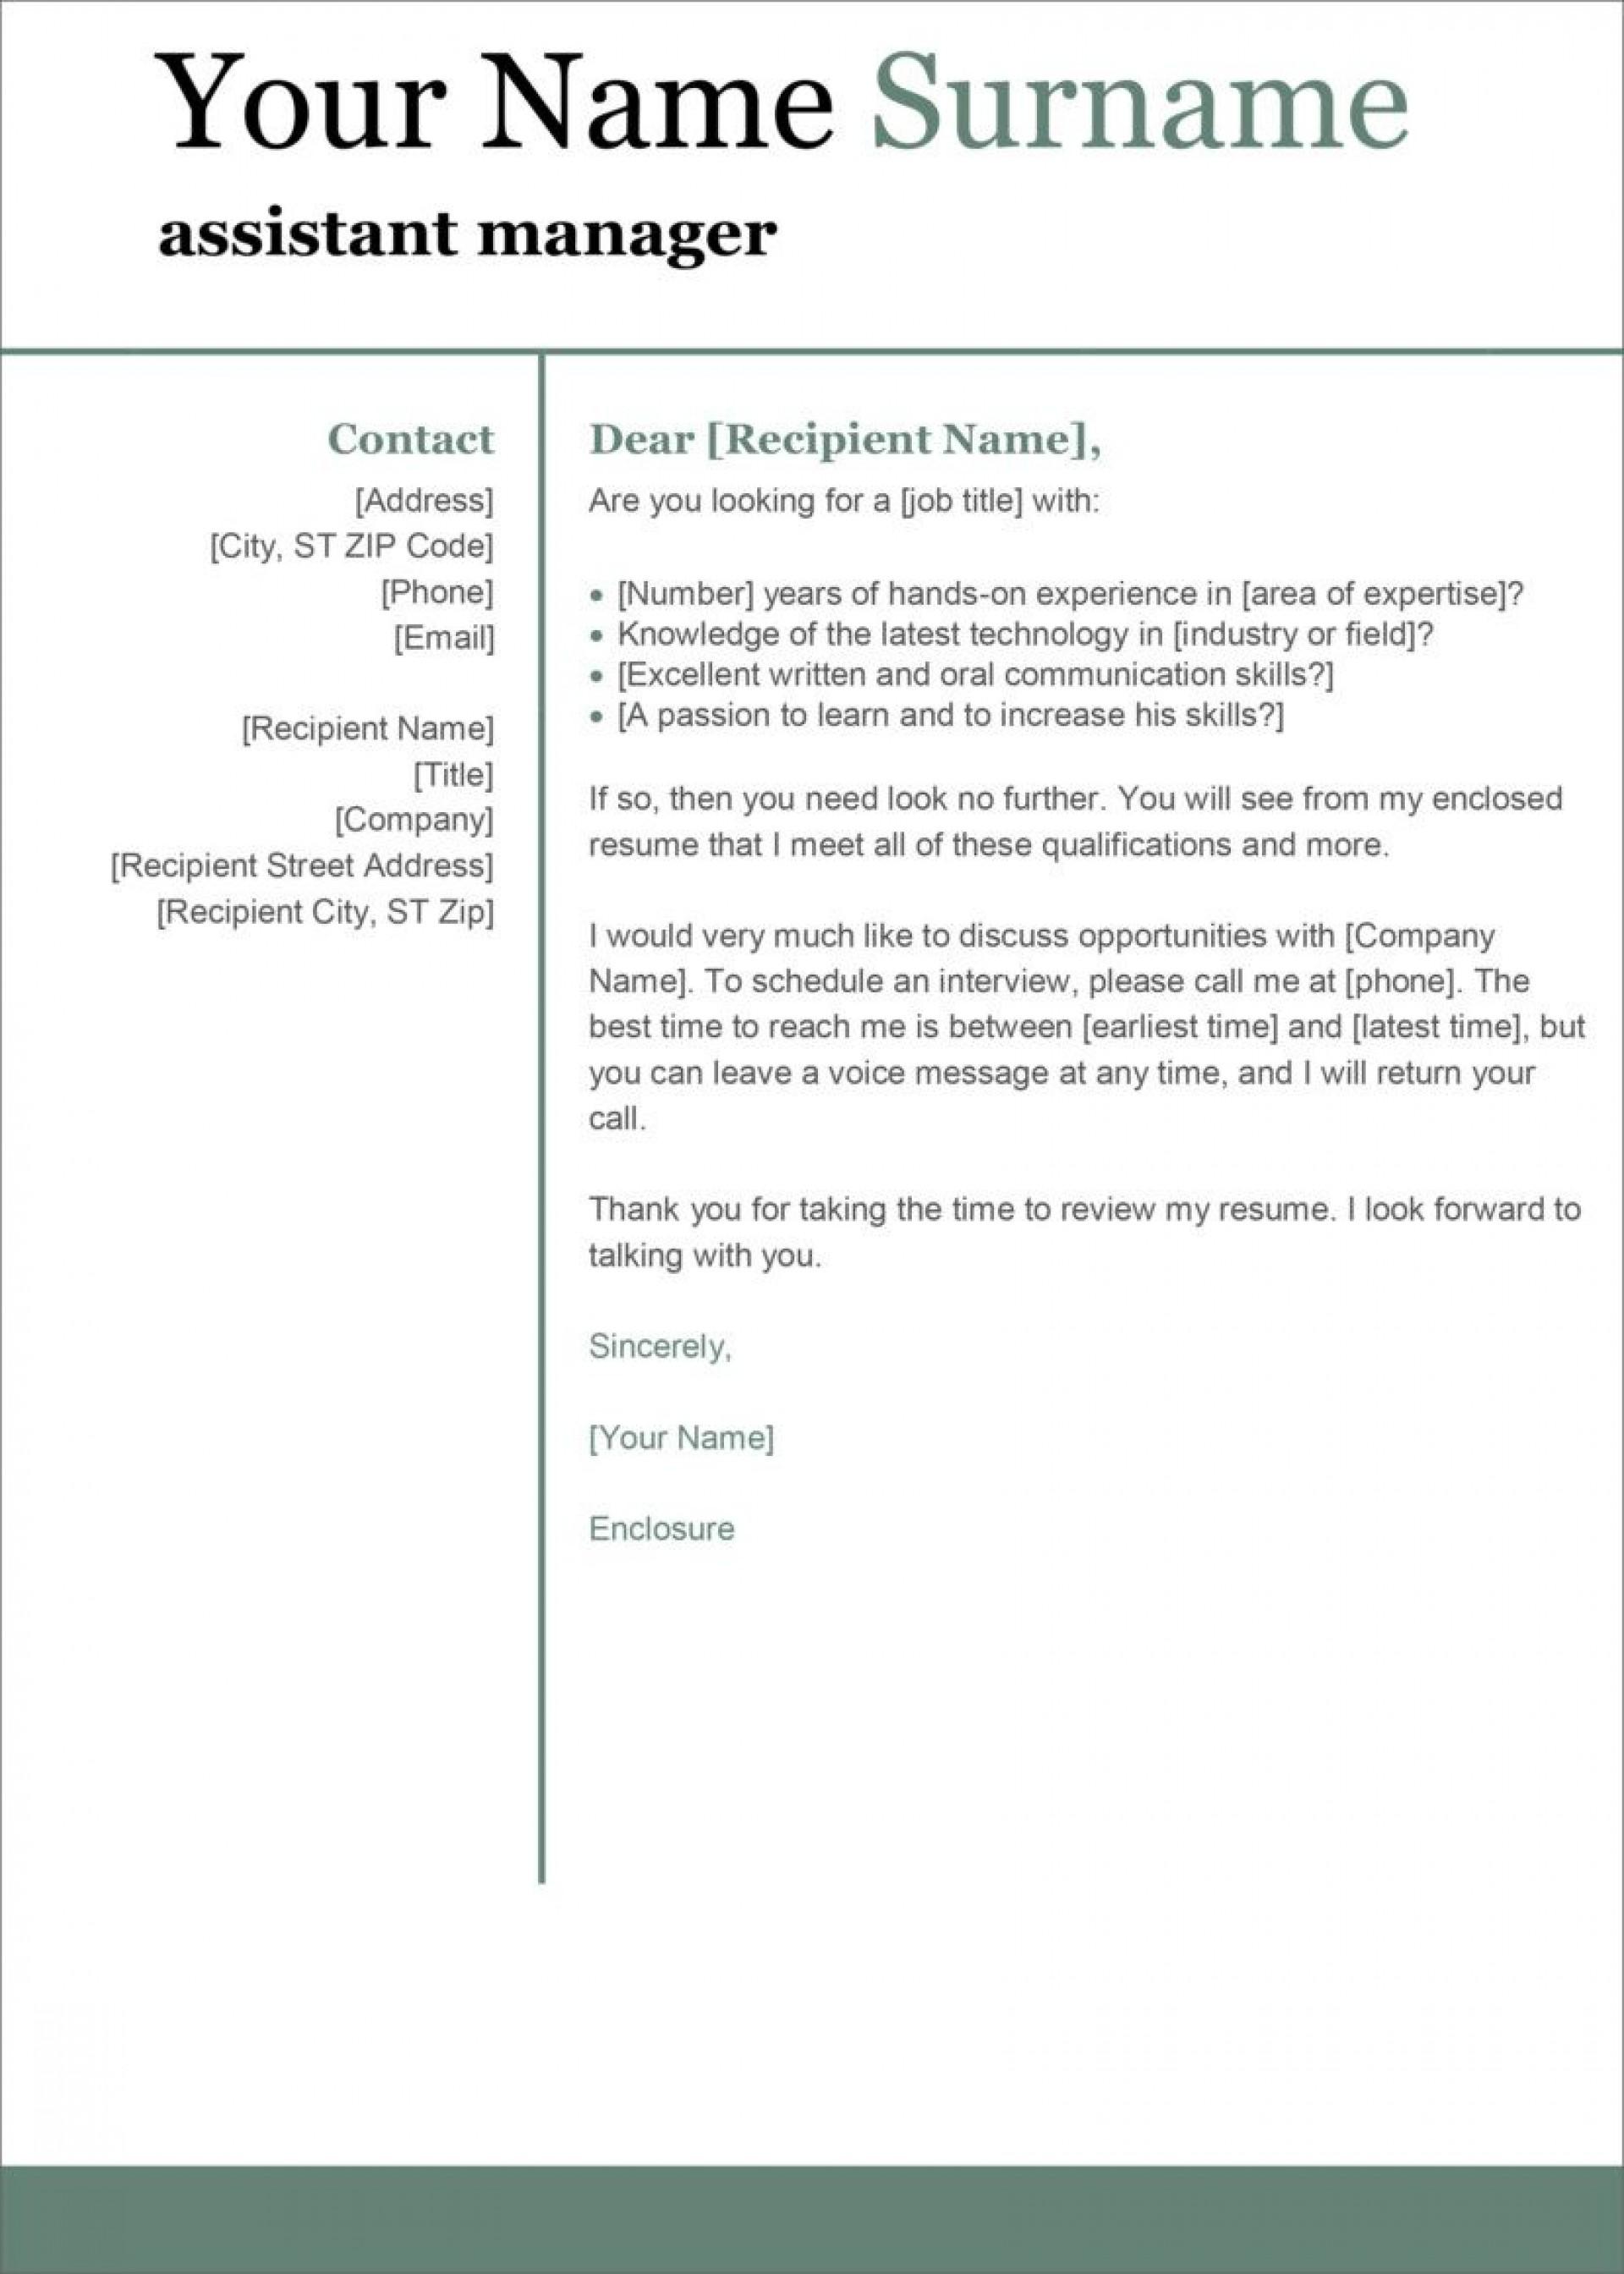 003 Breathtaking Letter Template Microsoft Word Design  Naval Format 2010 20071920